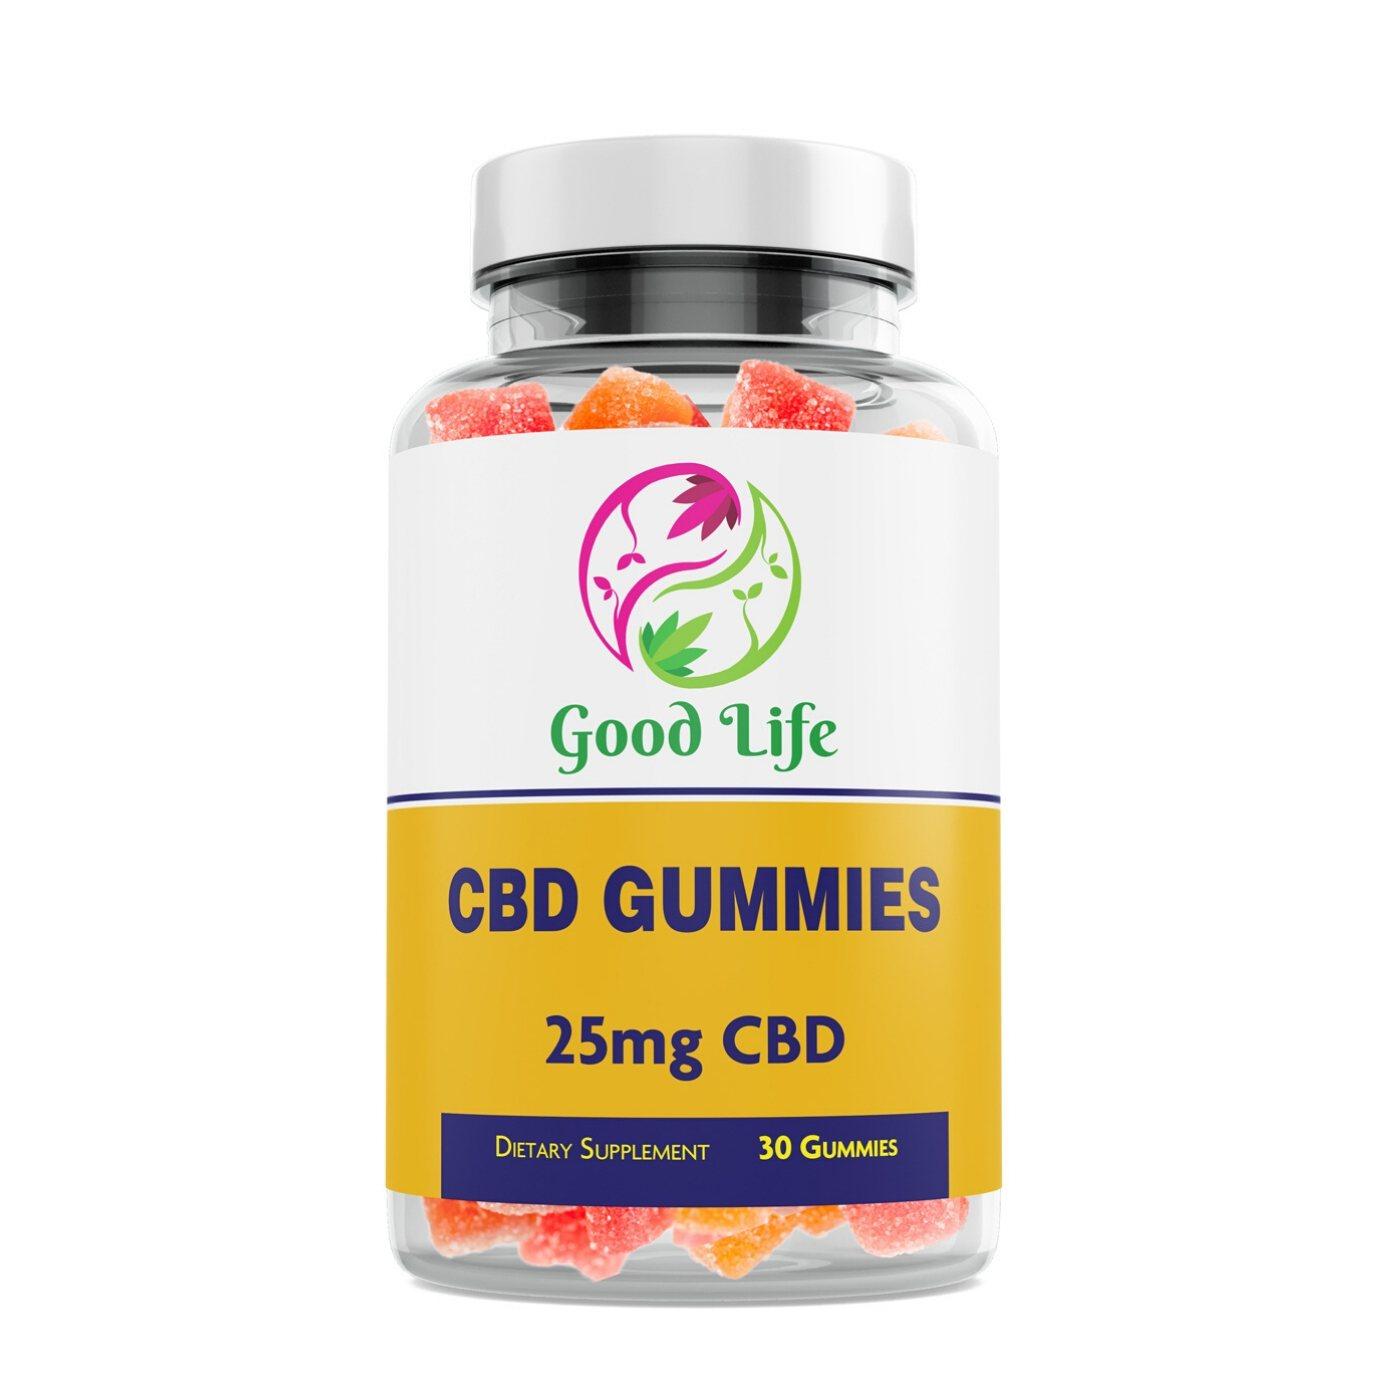 25mg CBD Gummies